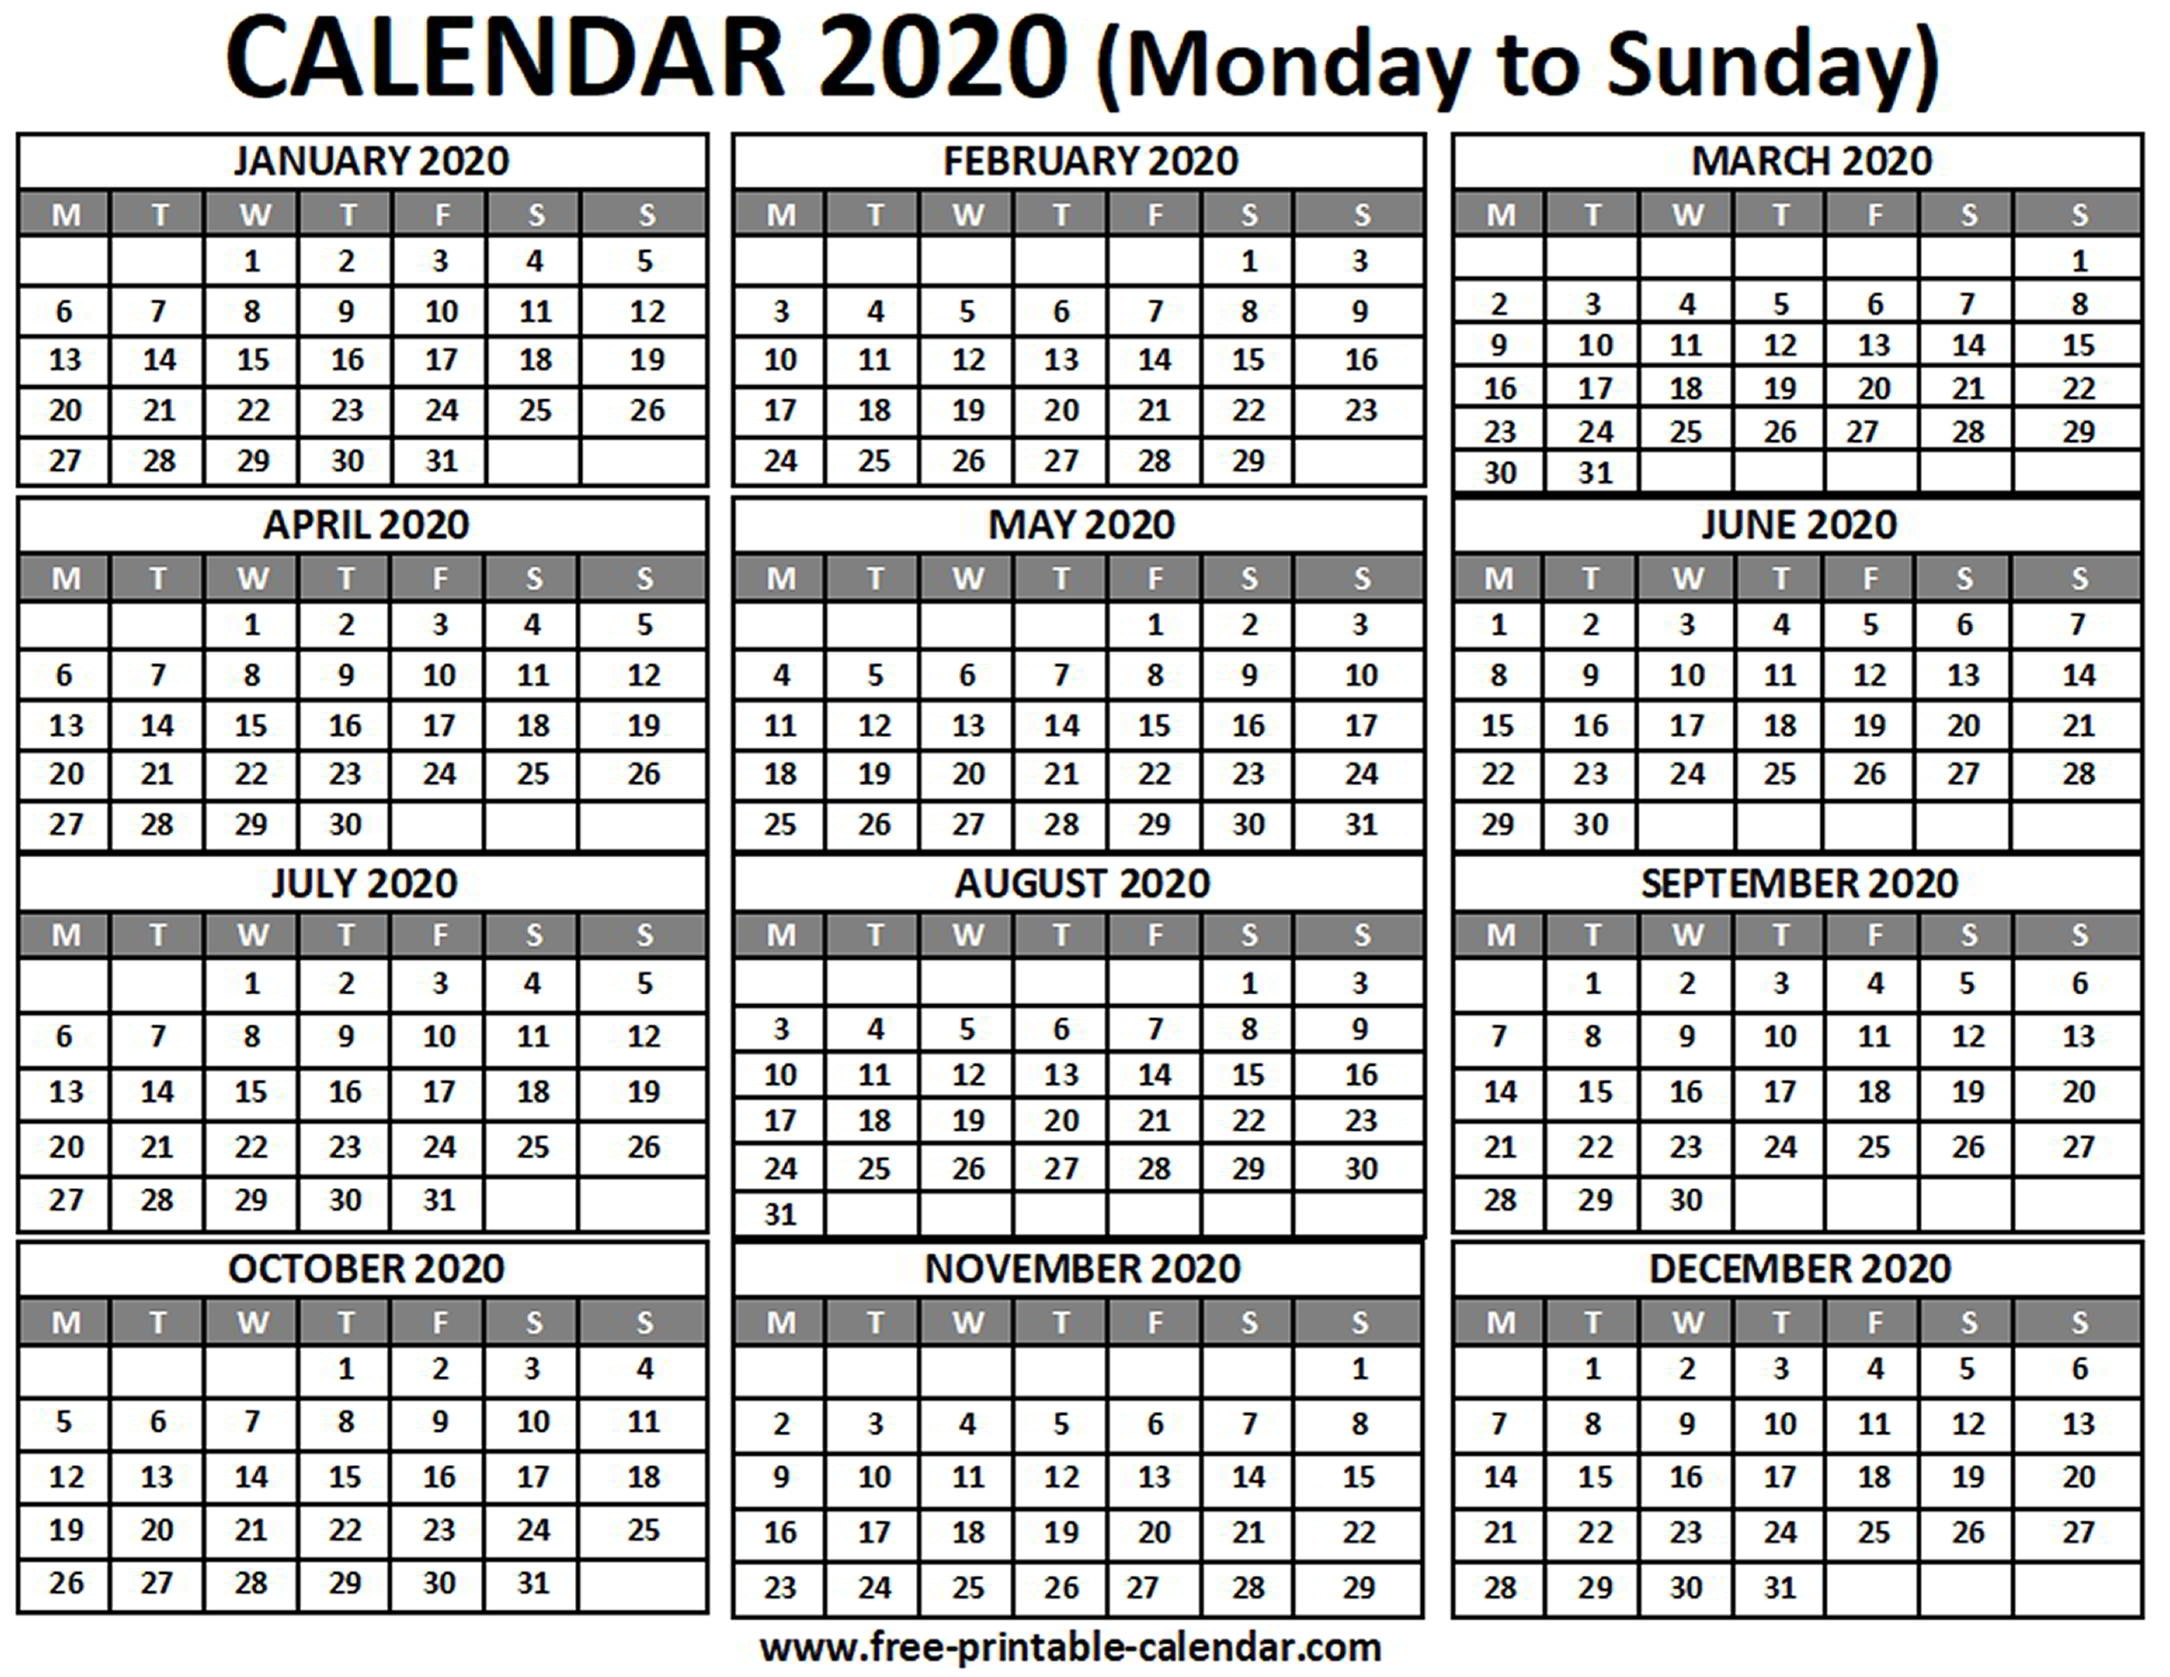 2020 Calendar - Free-Printable-Calendar regarding Free Calendar 2020 Starting With Mondays